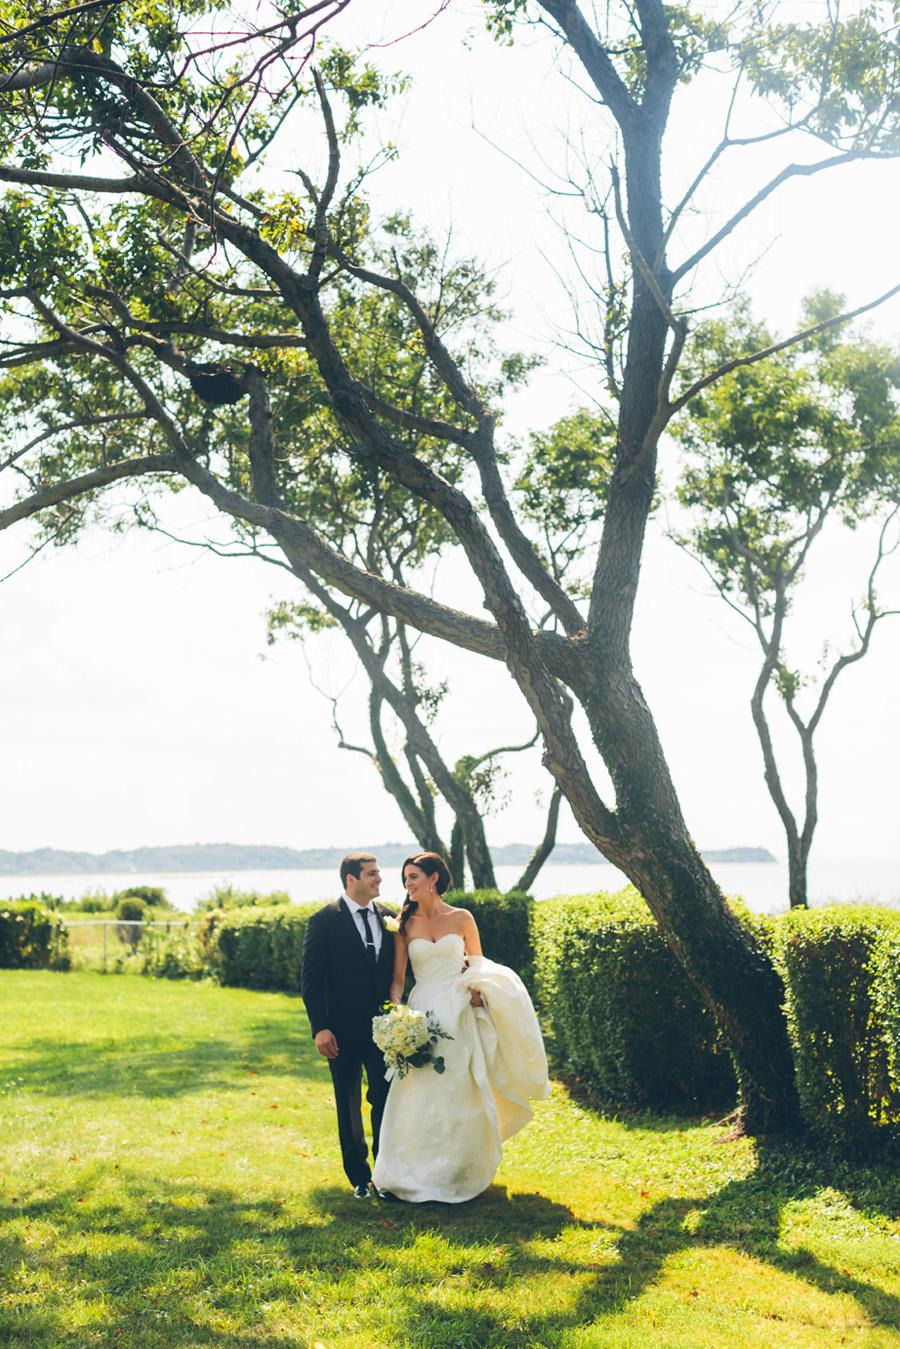 VICTORIA-BRIAN-NY-WEDDING-BRIDEGROOM-CYNTHIACHUNG-0080.jpg